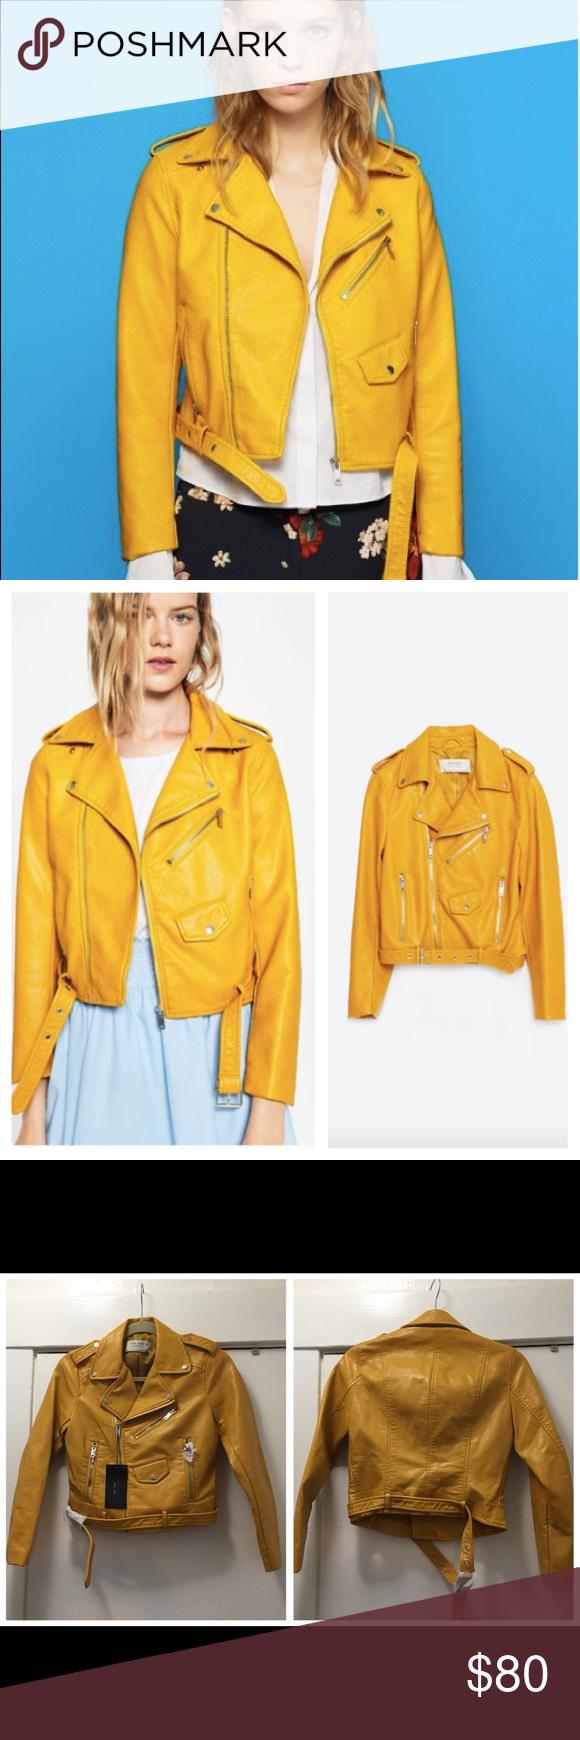 Zara NWT faux leather moto jacket size XS ⚡️ Super cute